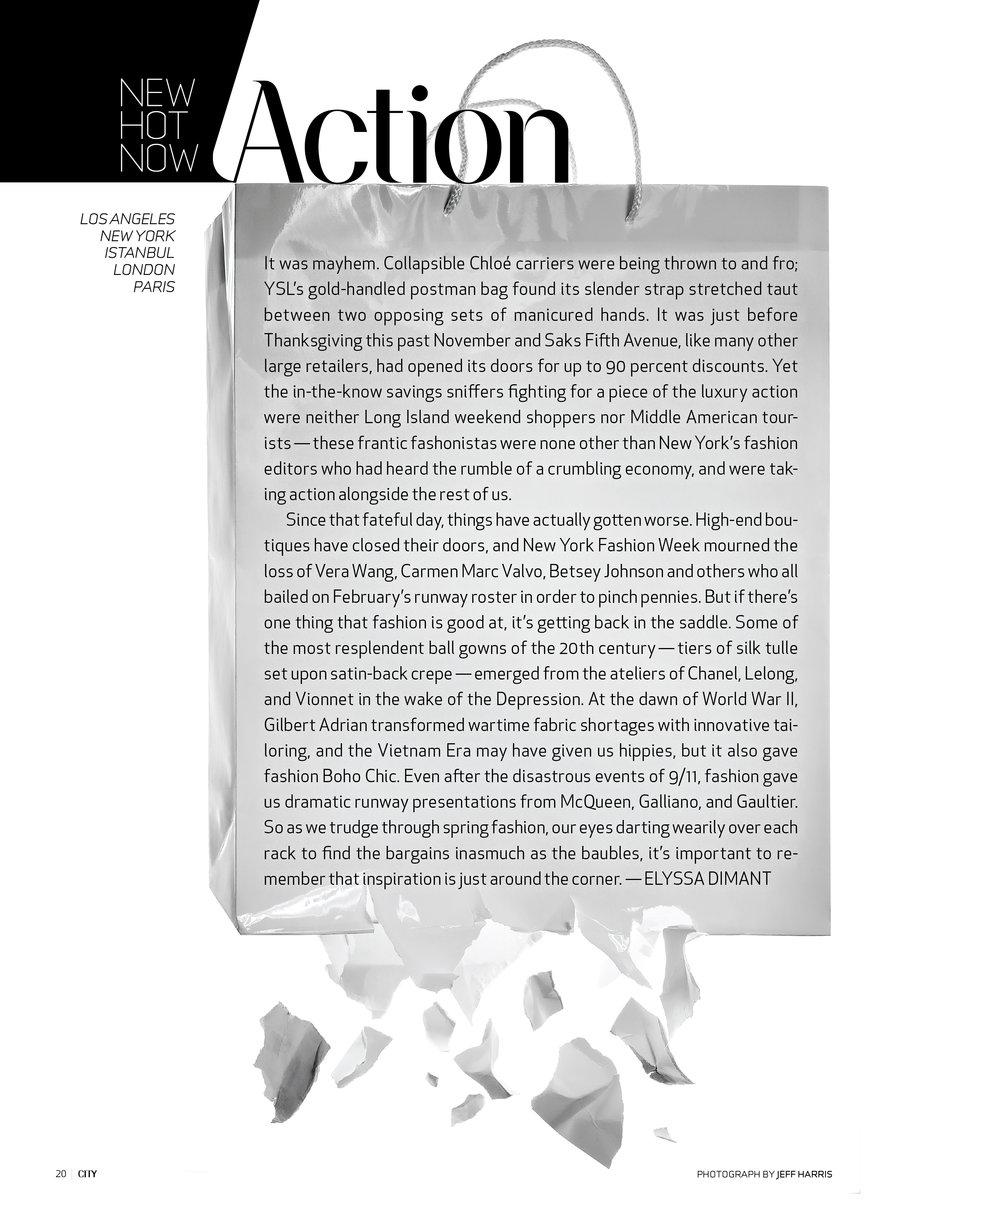 62_Action-1.jpg